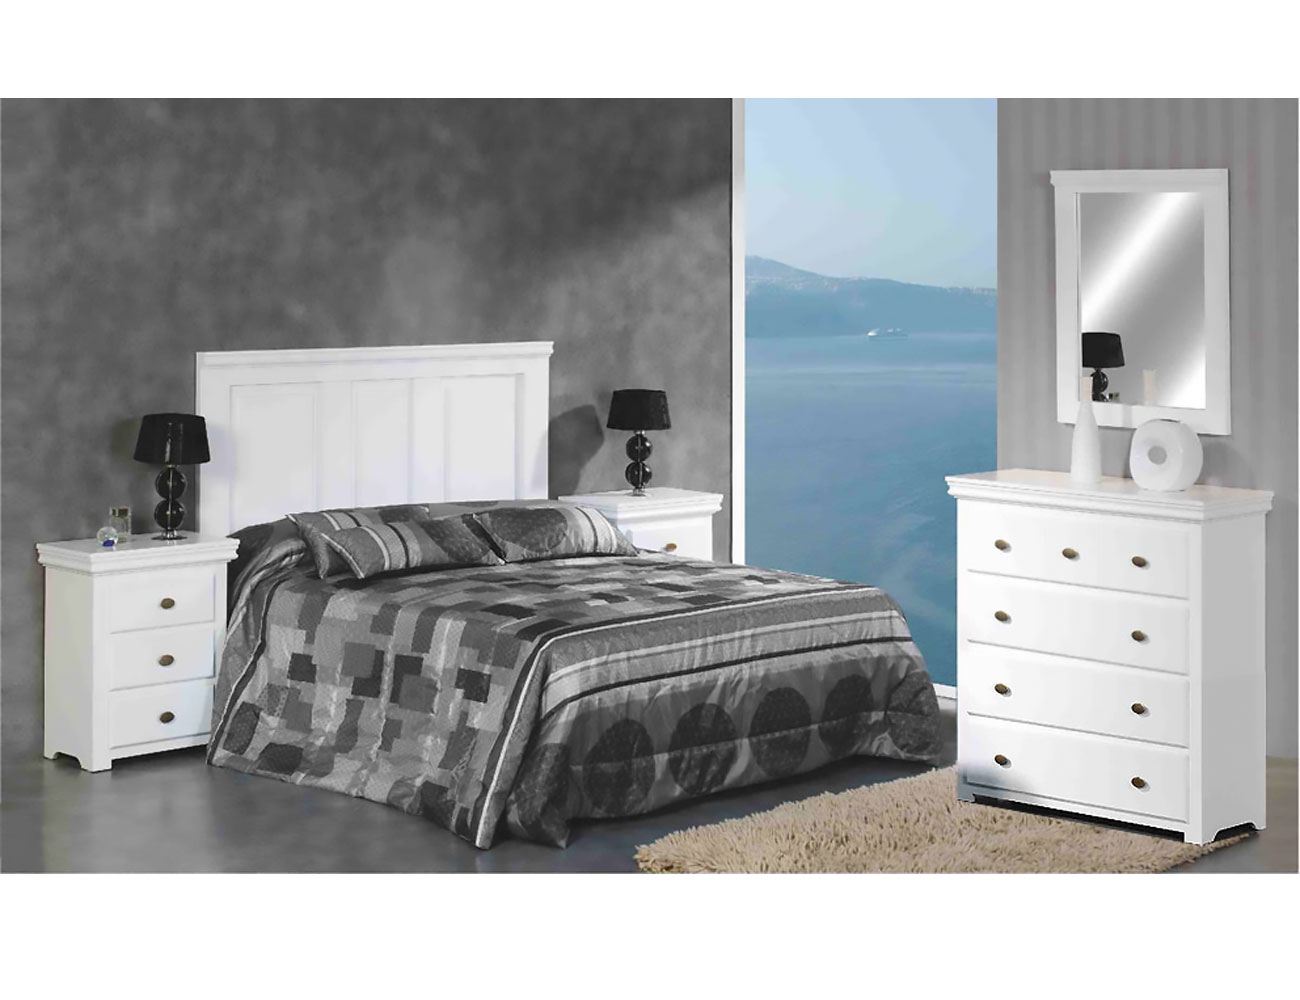 Dormitorio matrimonio comoda 5 c madera dm lacado blanco10